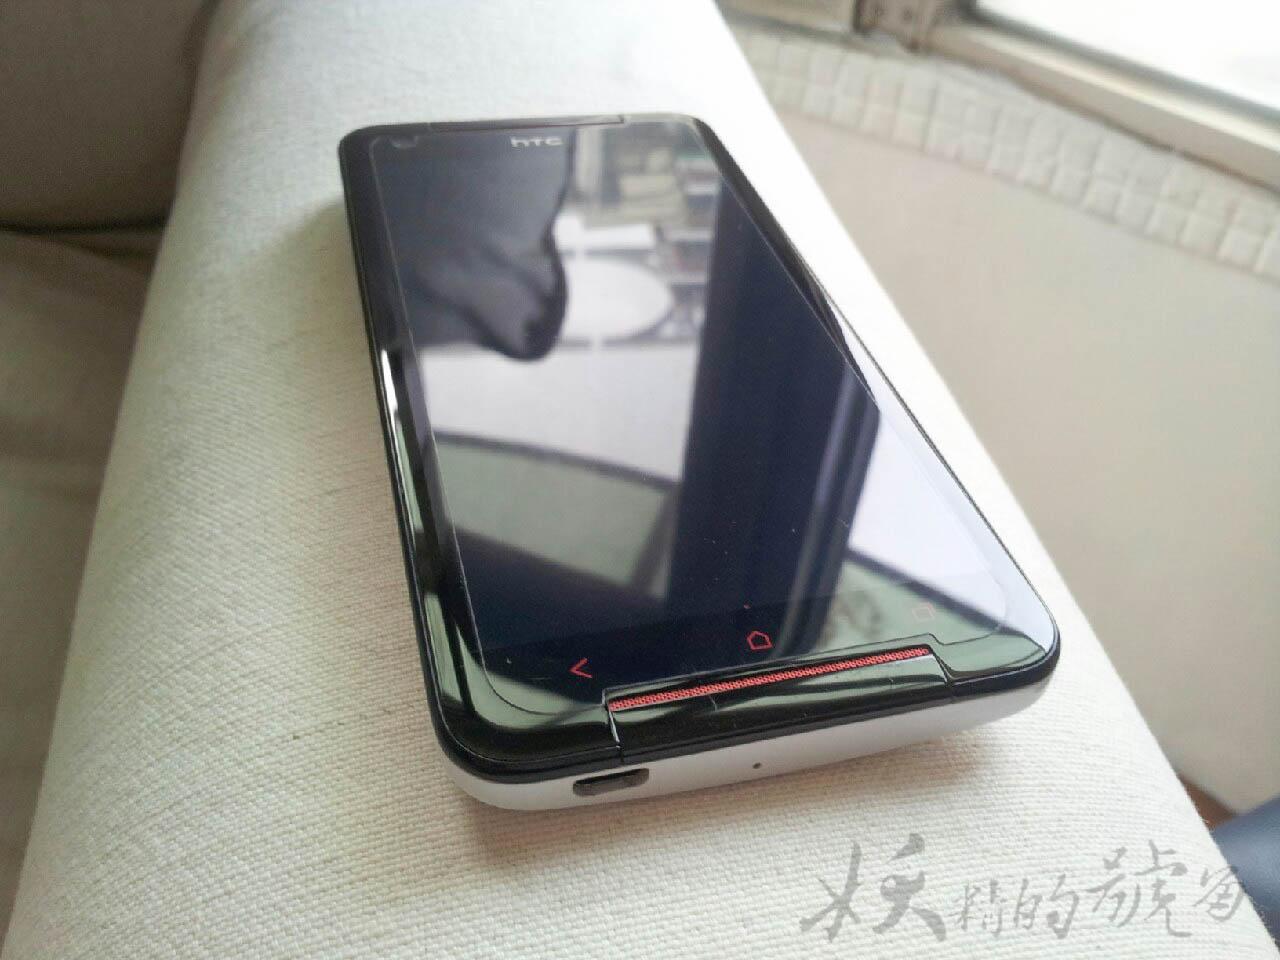 20150806 5713 - HTC Butterfly S 相機紫光 - 過保維修記(已s-off + Unlocked)